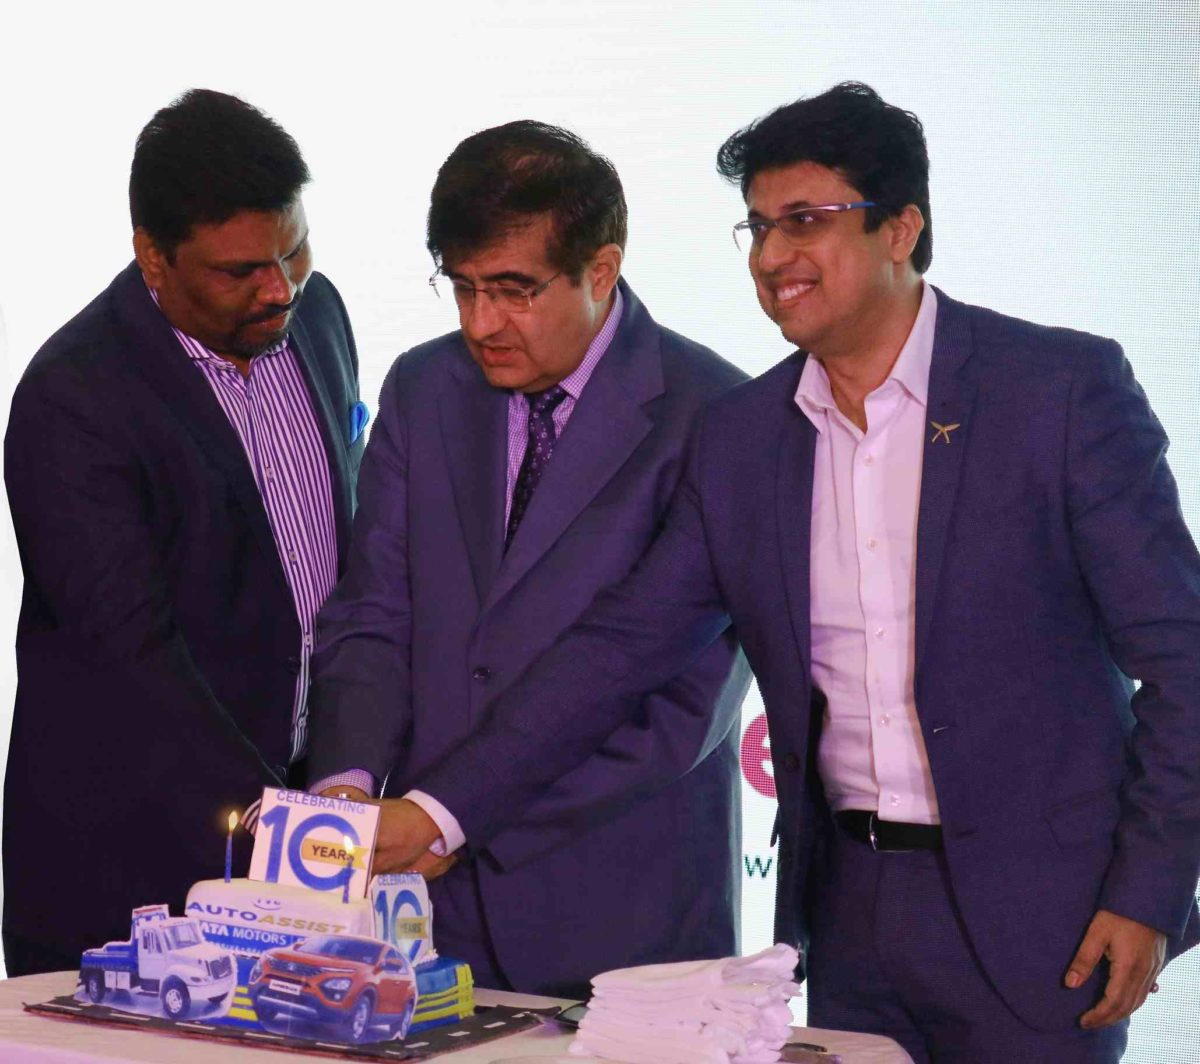 Mr. K. Mahesh Kumar, Mr. Mayank Pareek and Mr. Subhajit Roy